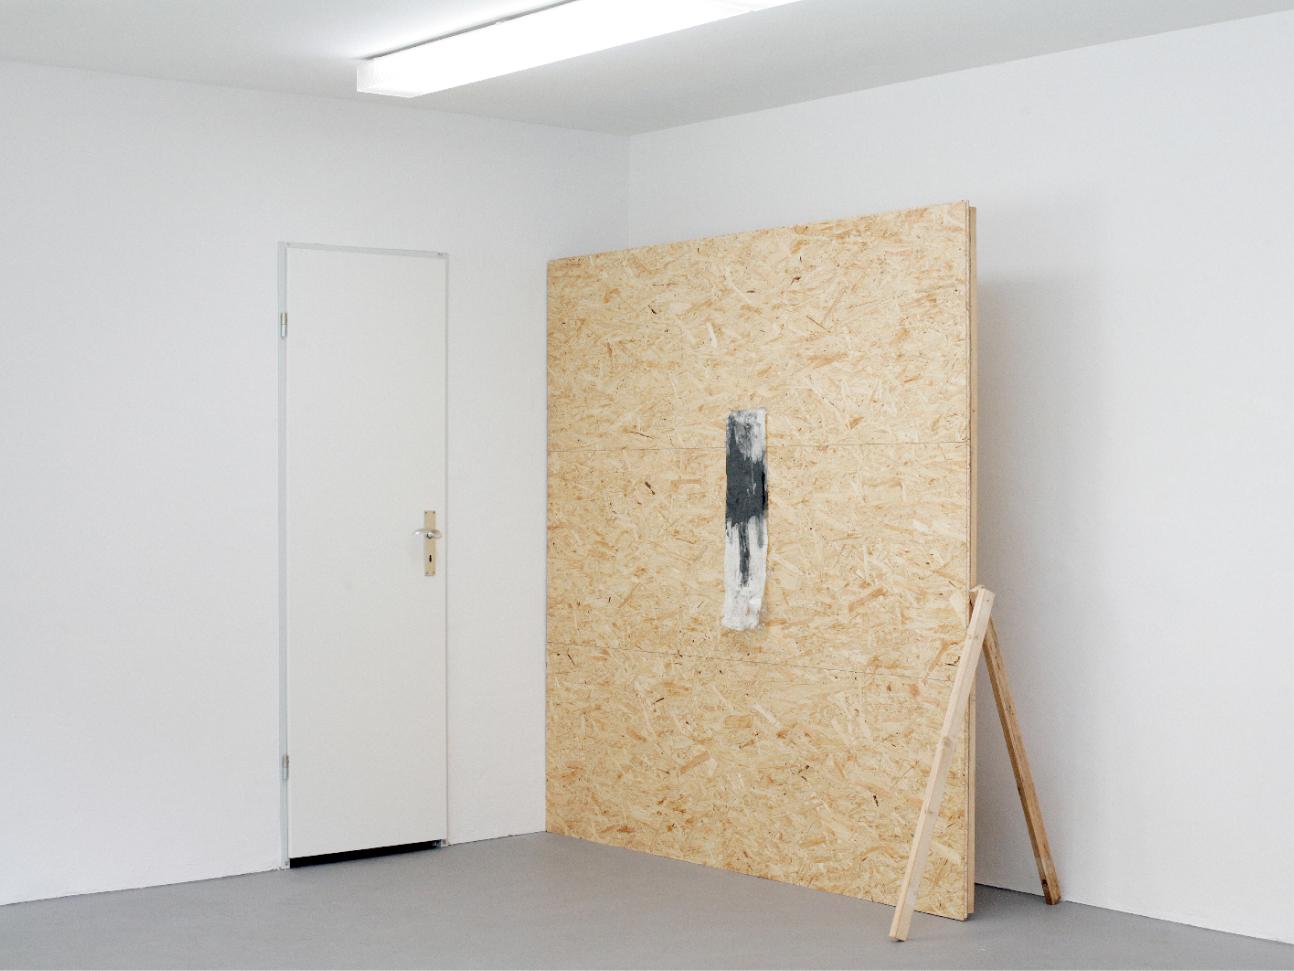 Galerie Desaga, Köln, 2009